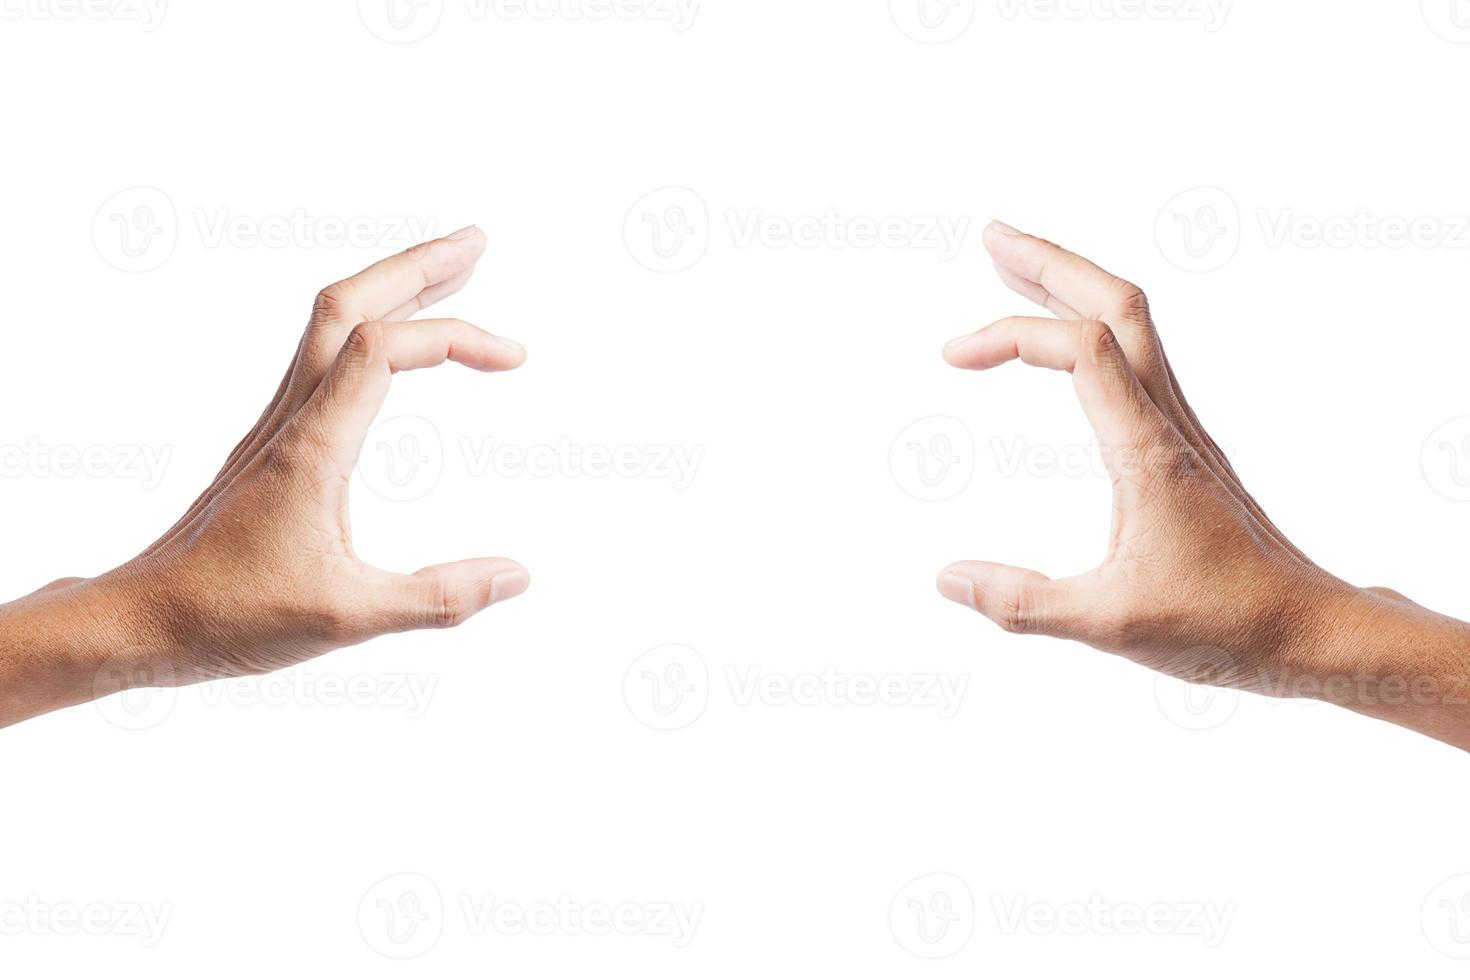 manlig hand isolerad på vit bakgrund foto